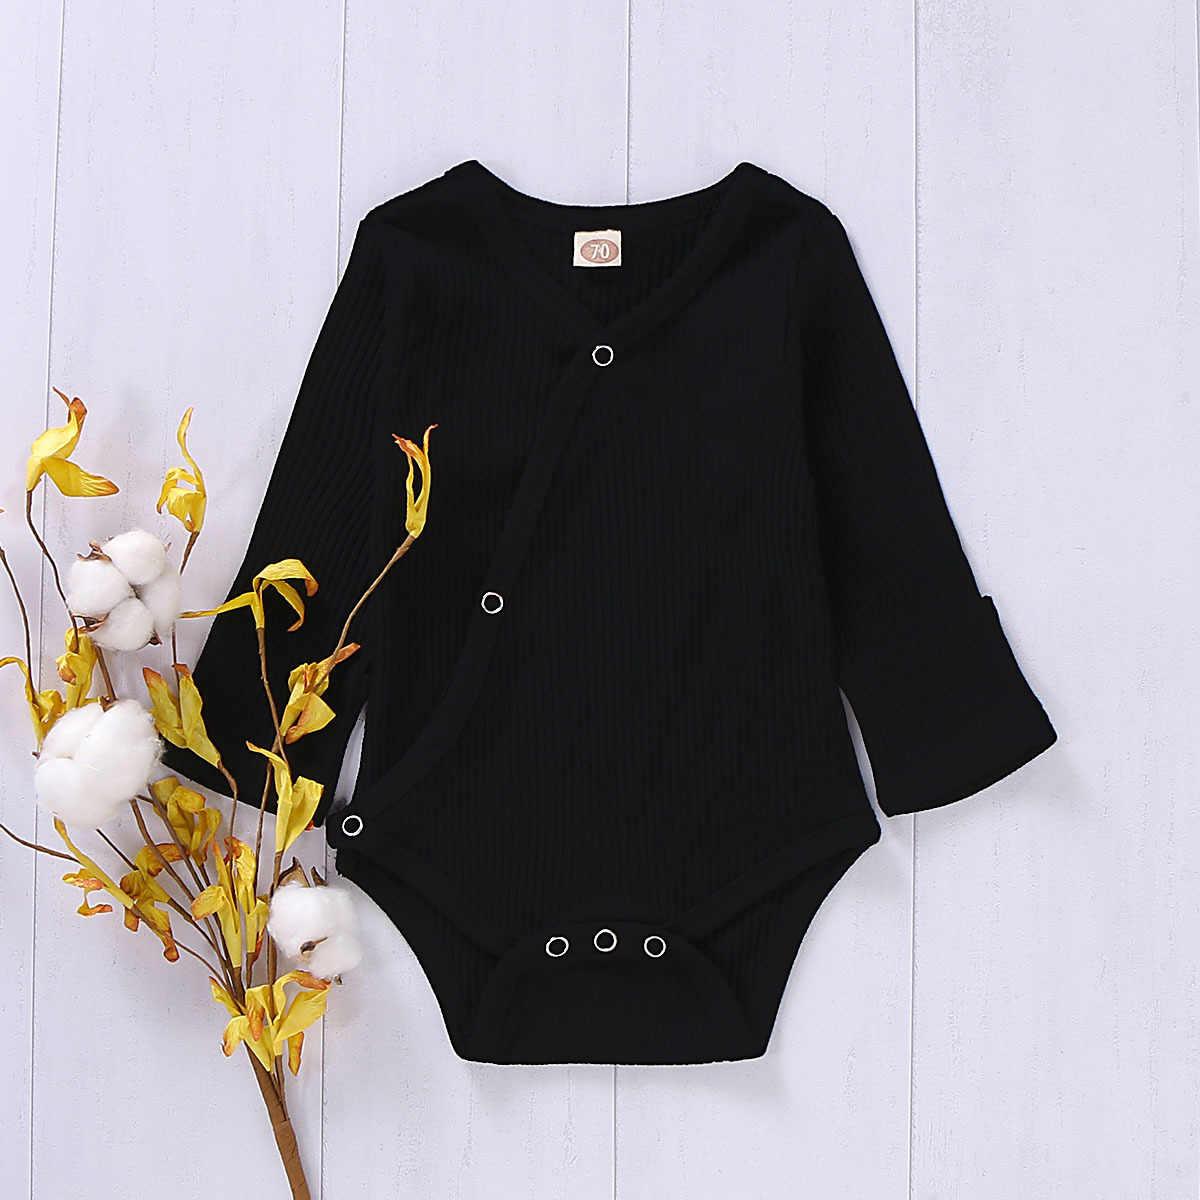 Mono para bebés recién nacidos, niñas, niños, Bodysuit, ropa de otoño, de manga larga, sólido, mono, ropa de bebé